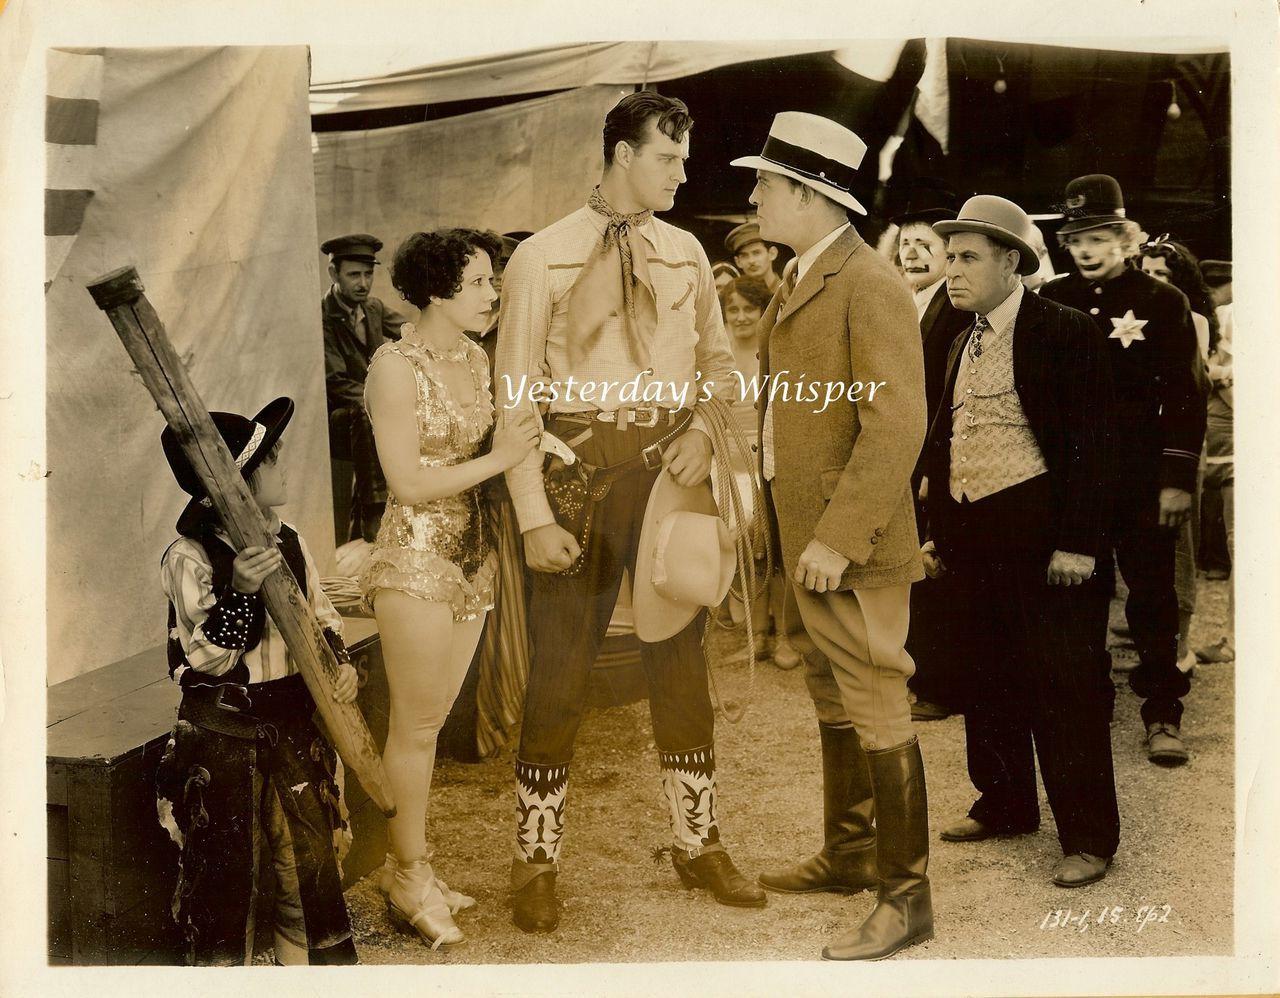 Francis X. BUSHMAN Leggy Alberta VAUGHN Circus Photo